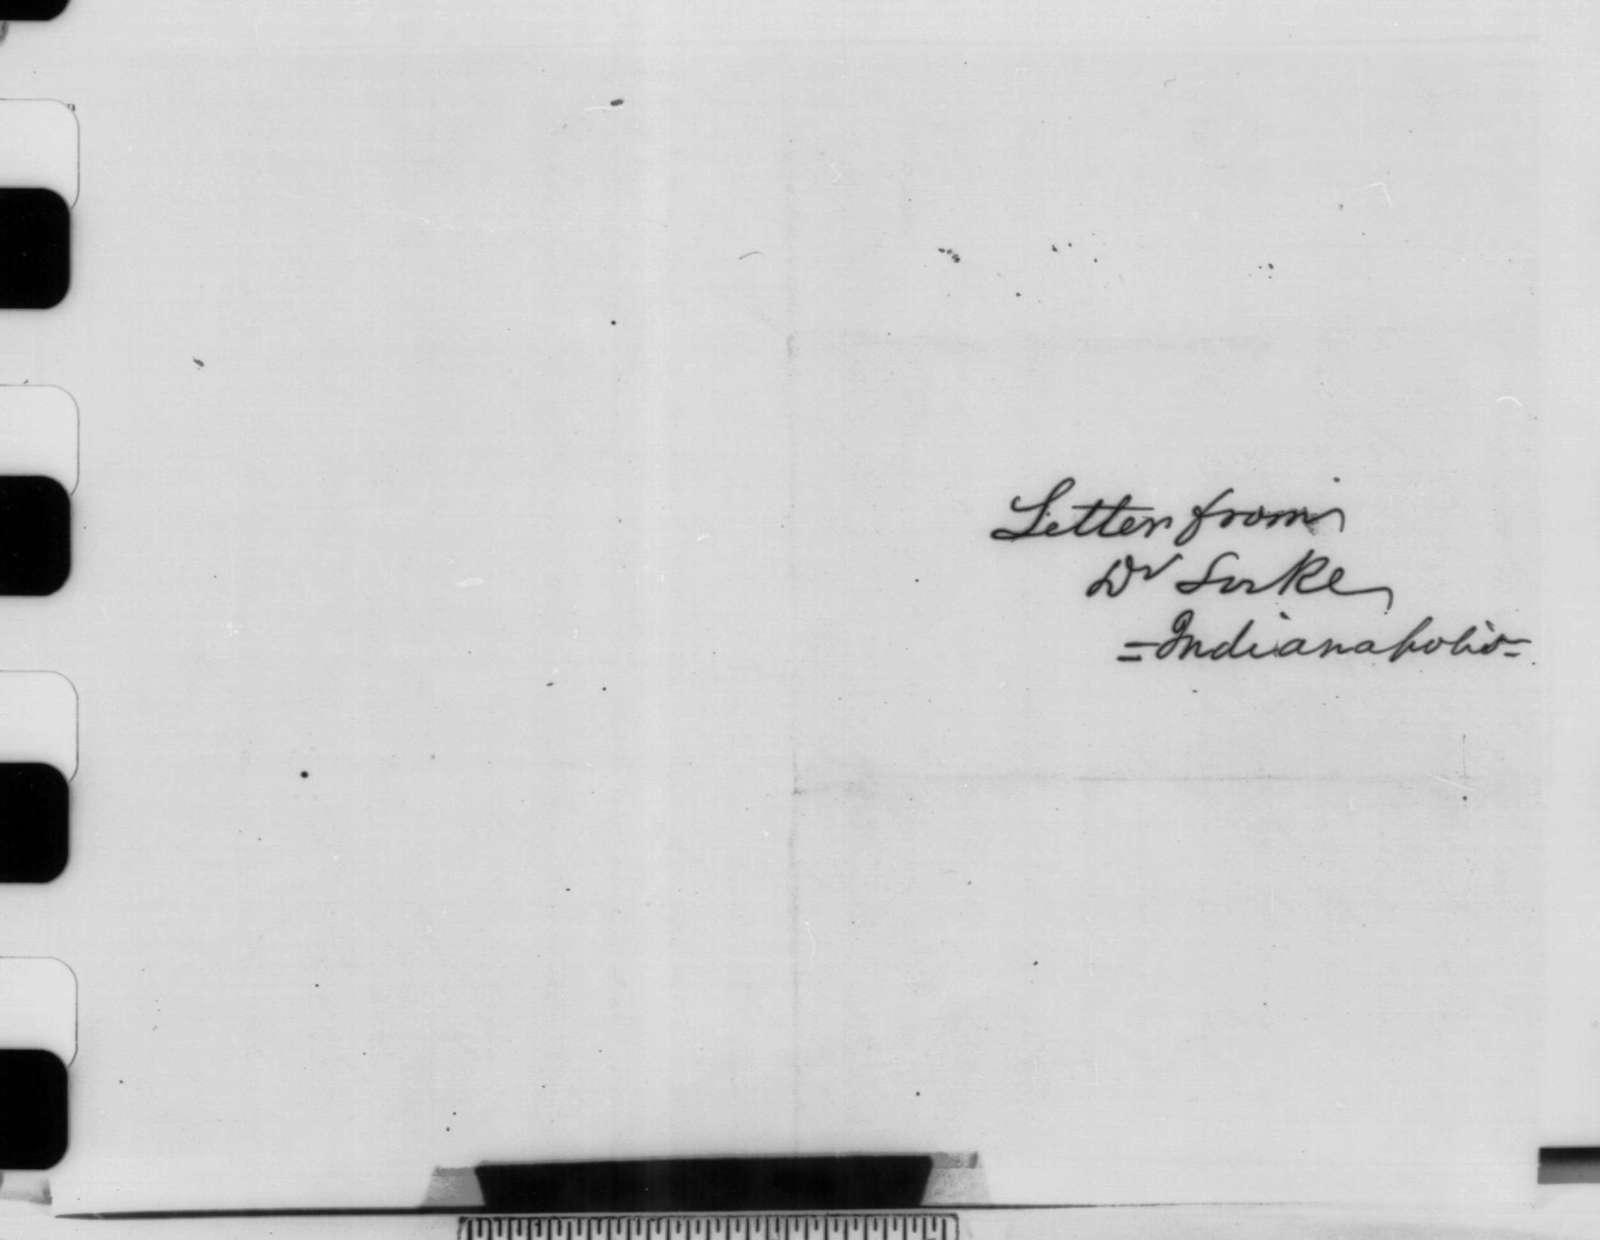 Eric Locke to David Davis, Wednesday, December 26, 1860  (Recommends Caleb Smith)